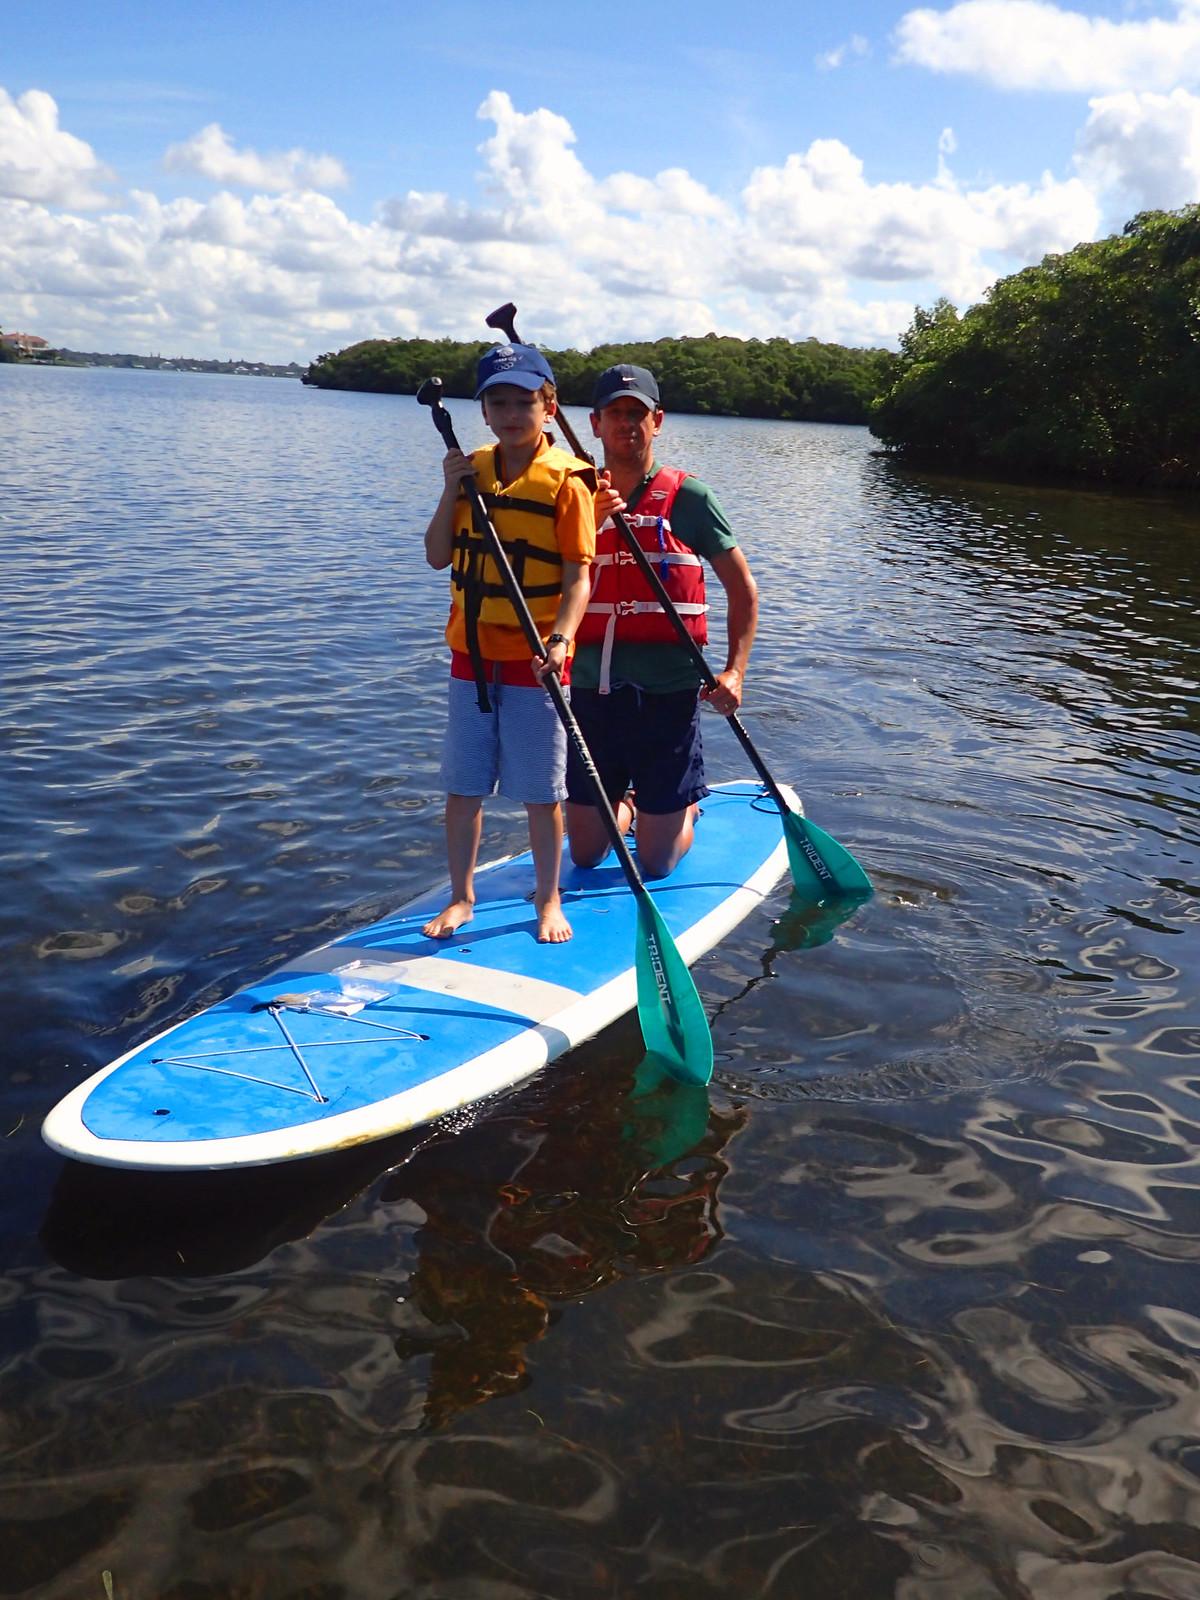 Tandem paddling!